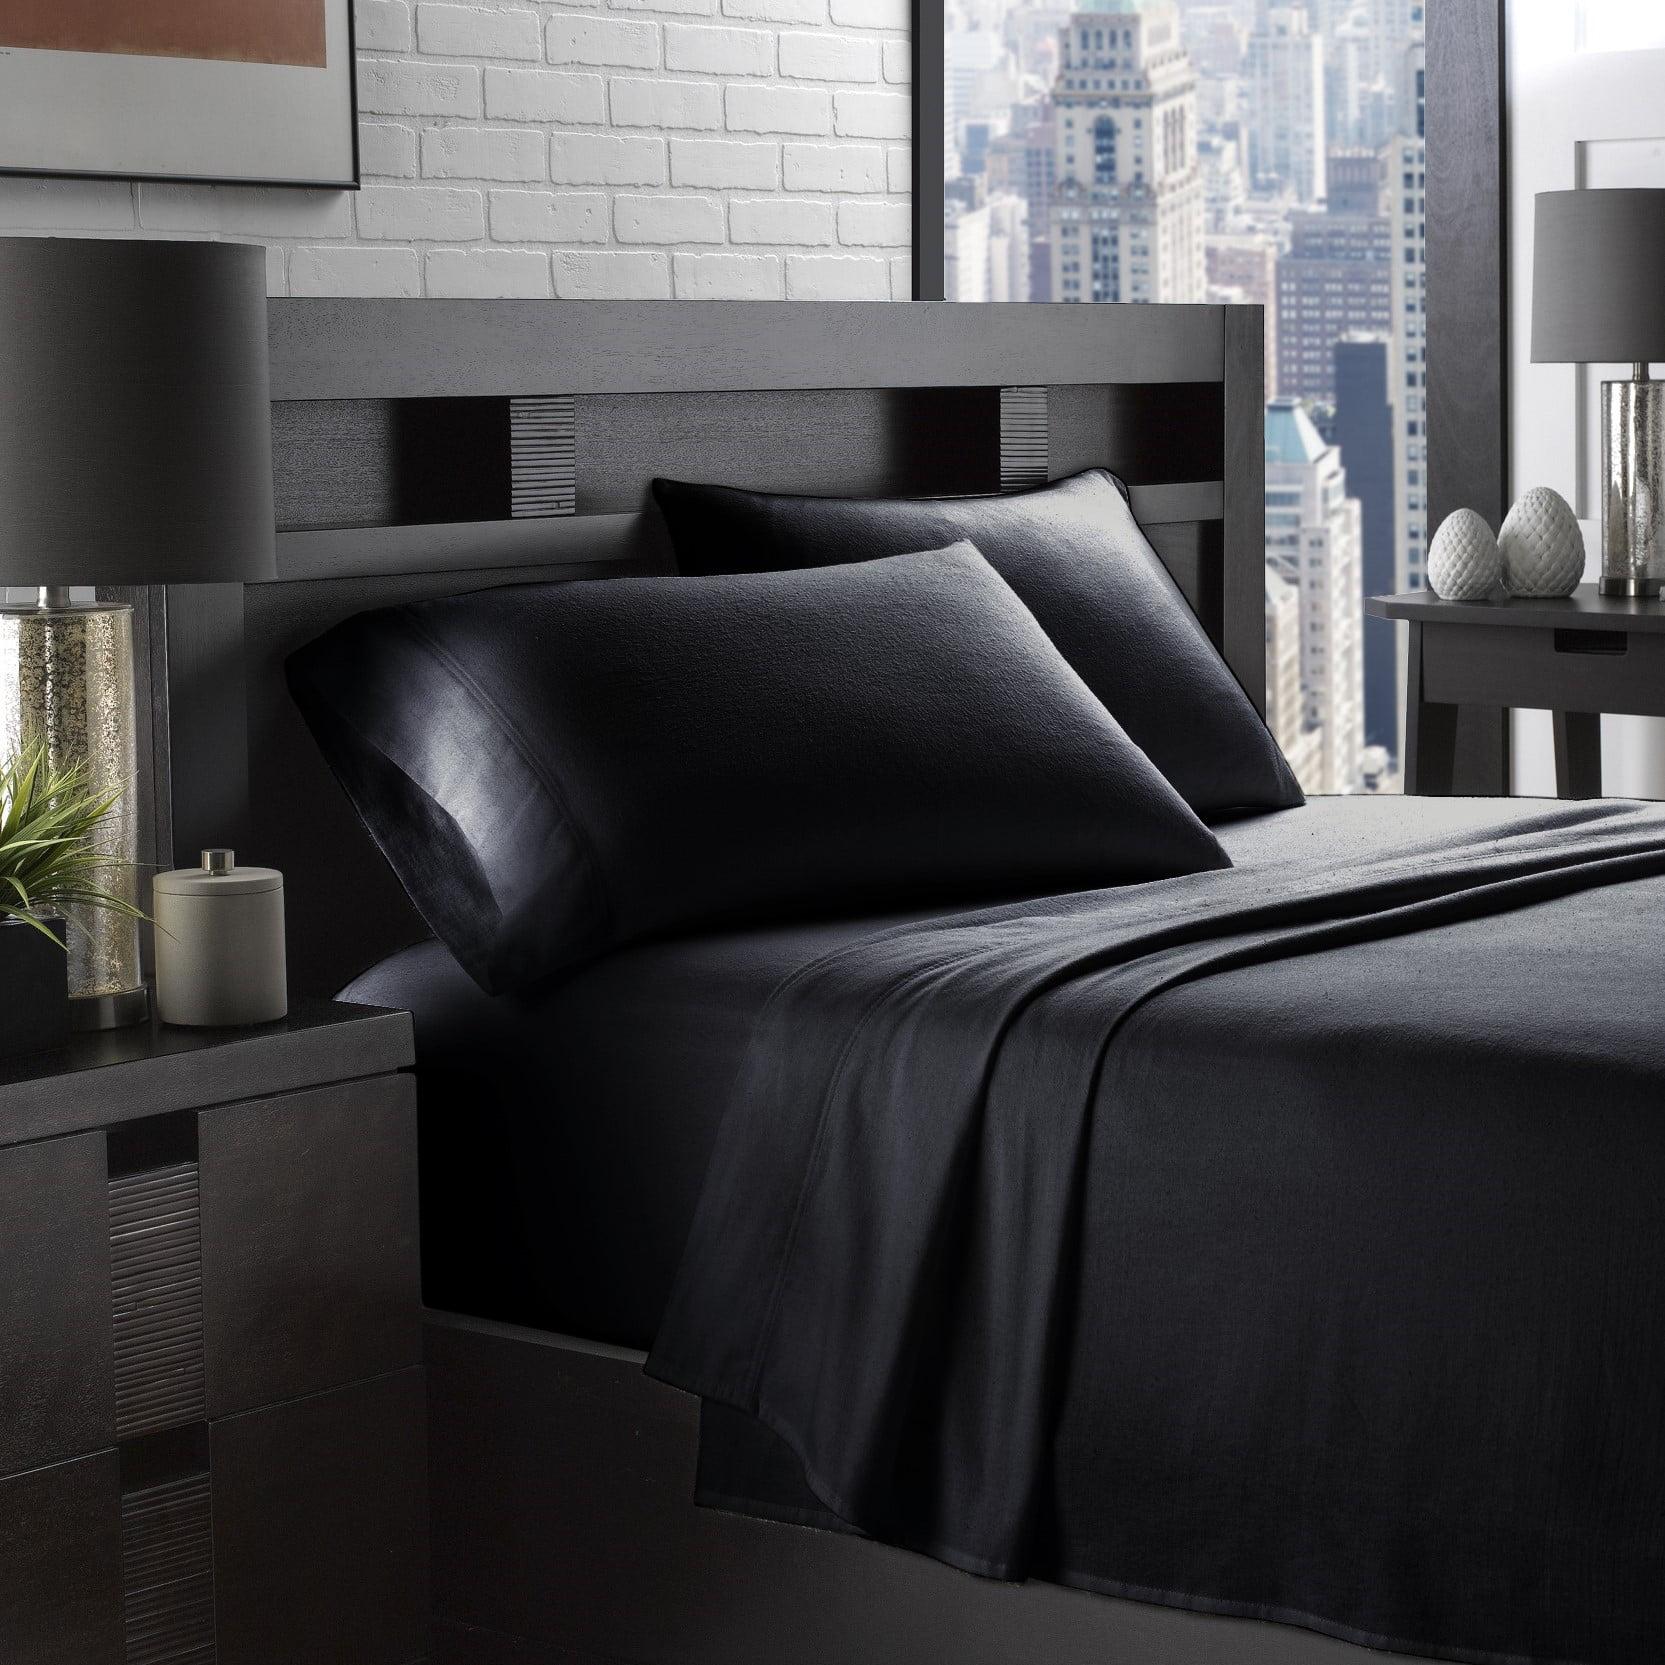 100% Cotton Flannel 4-Piece Ultra Cozy Sheet Set